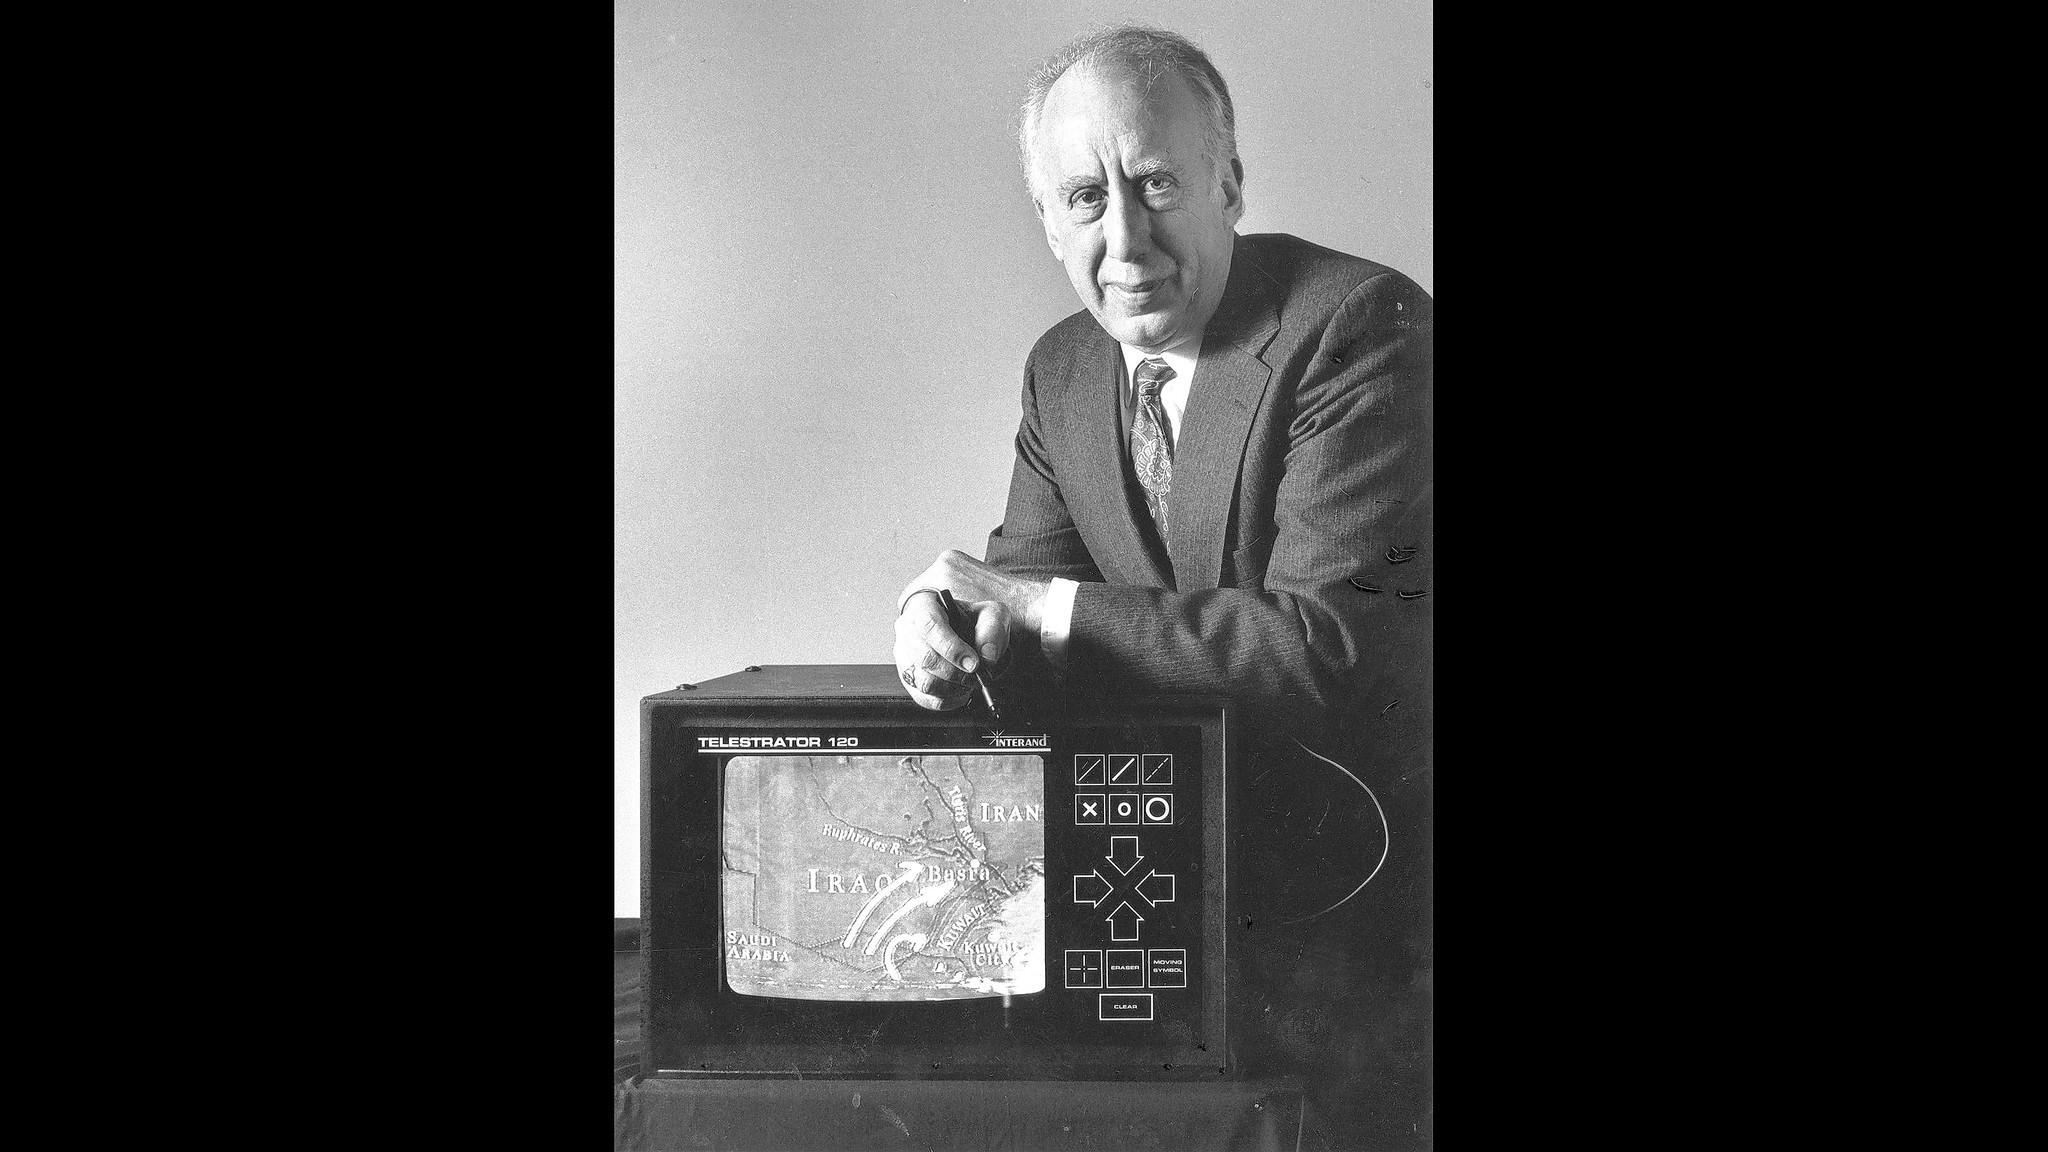 Leonard Reiffel  inventor of telestrator used to show NFL